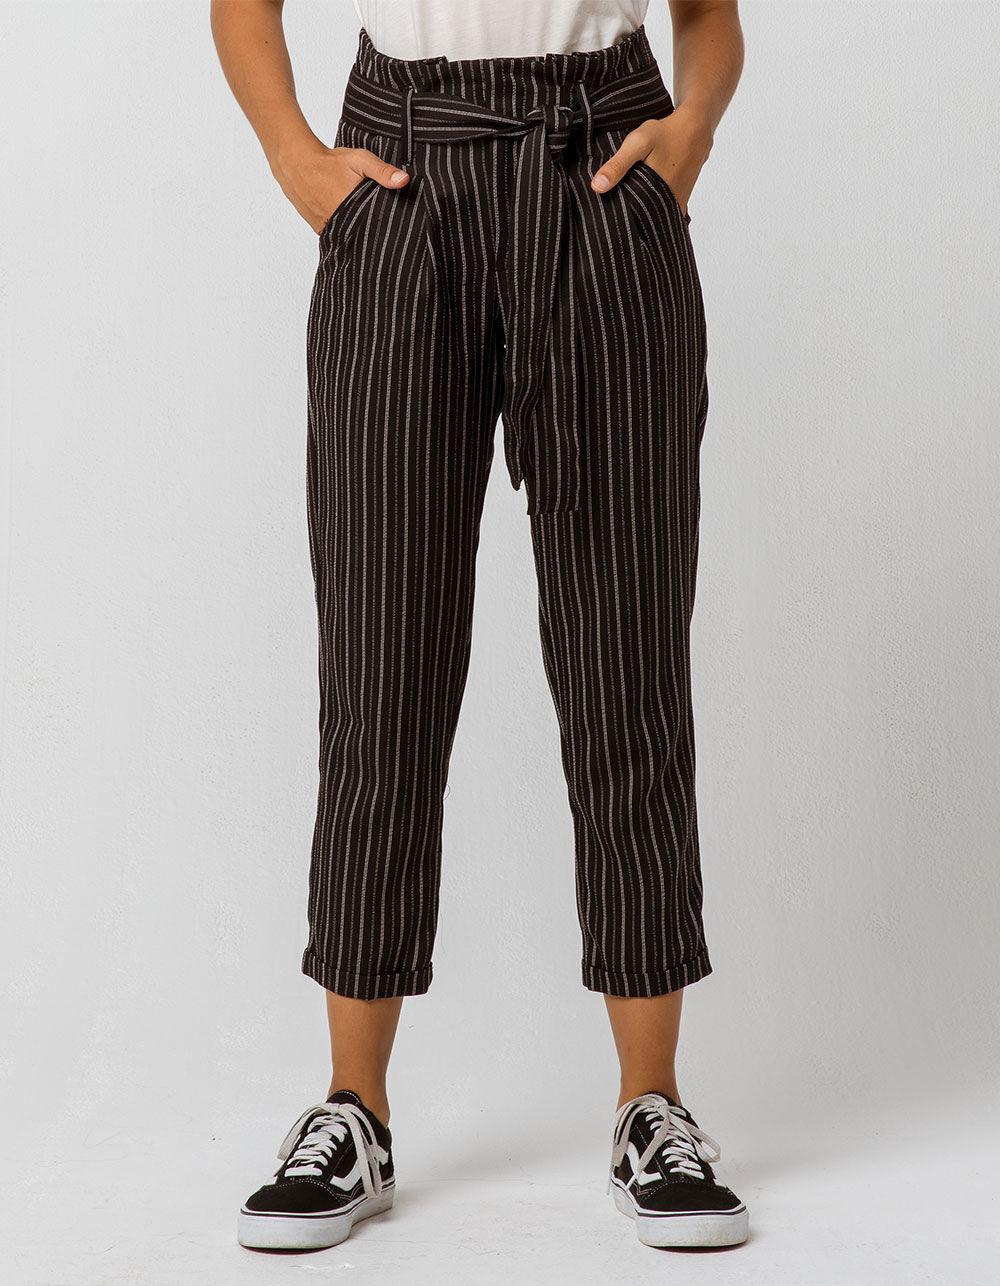 INDIGO REIN Stripe Paperbag Waist Black & White Trouser Pants